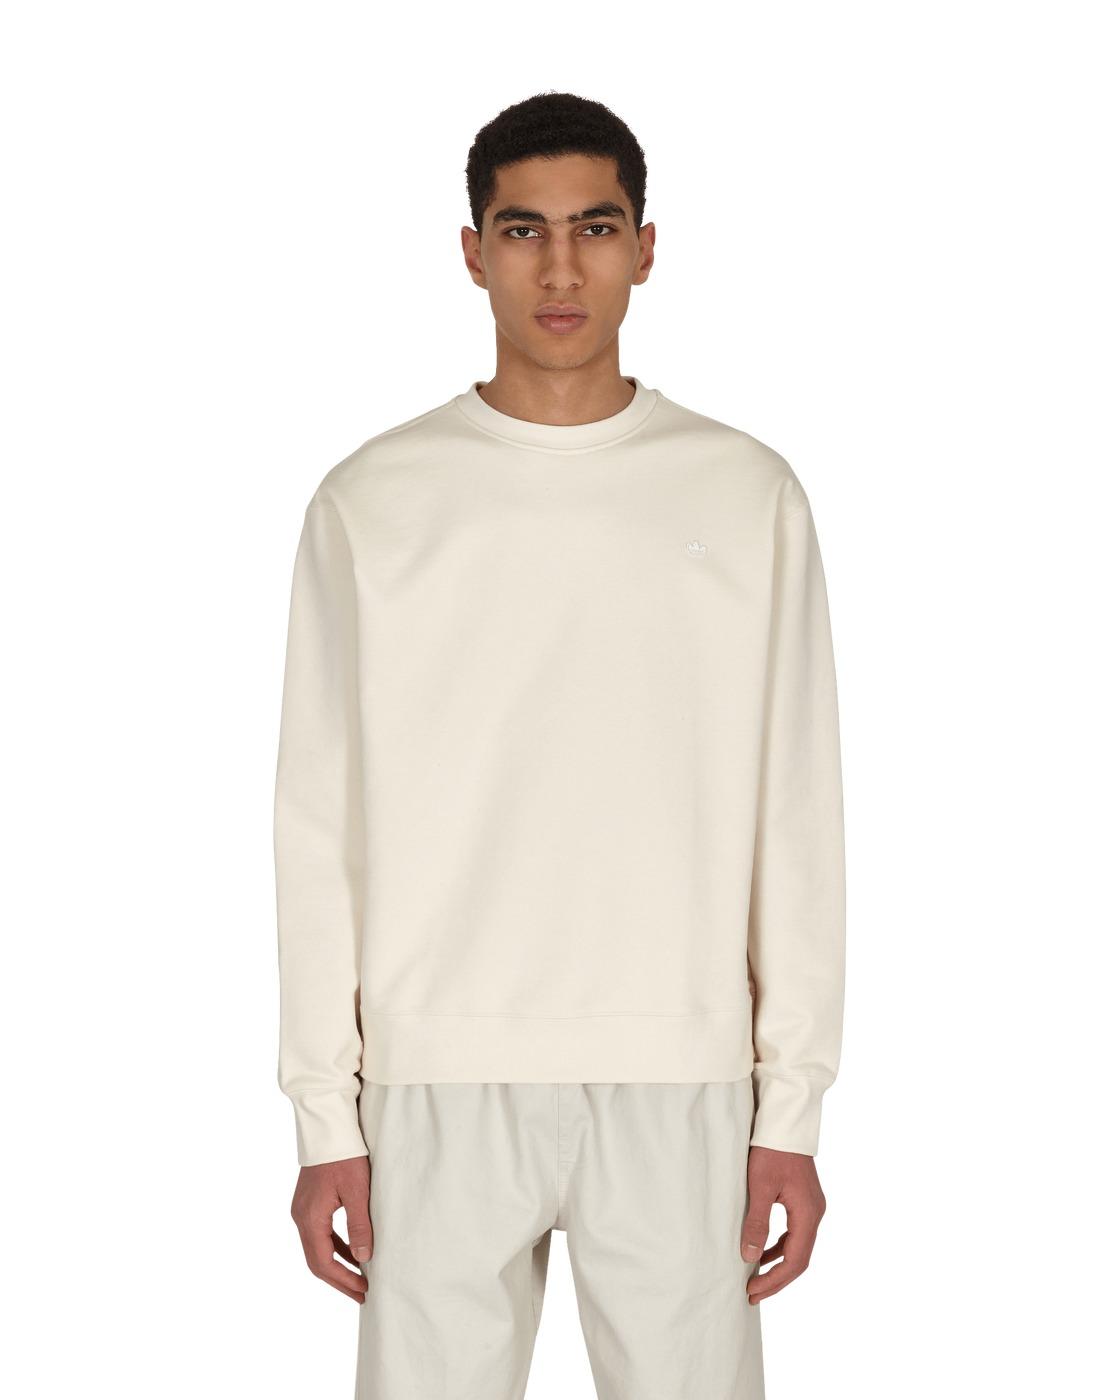 Adidas Originals Adicolor Premium Crewneck Sweatshirt Non Dyed